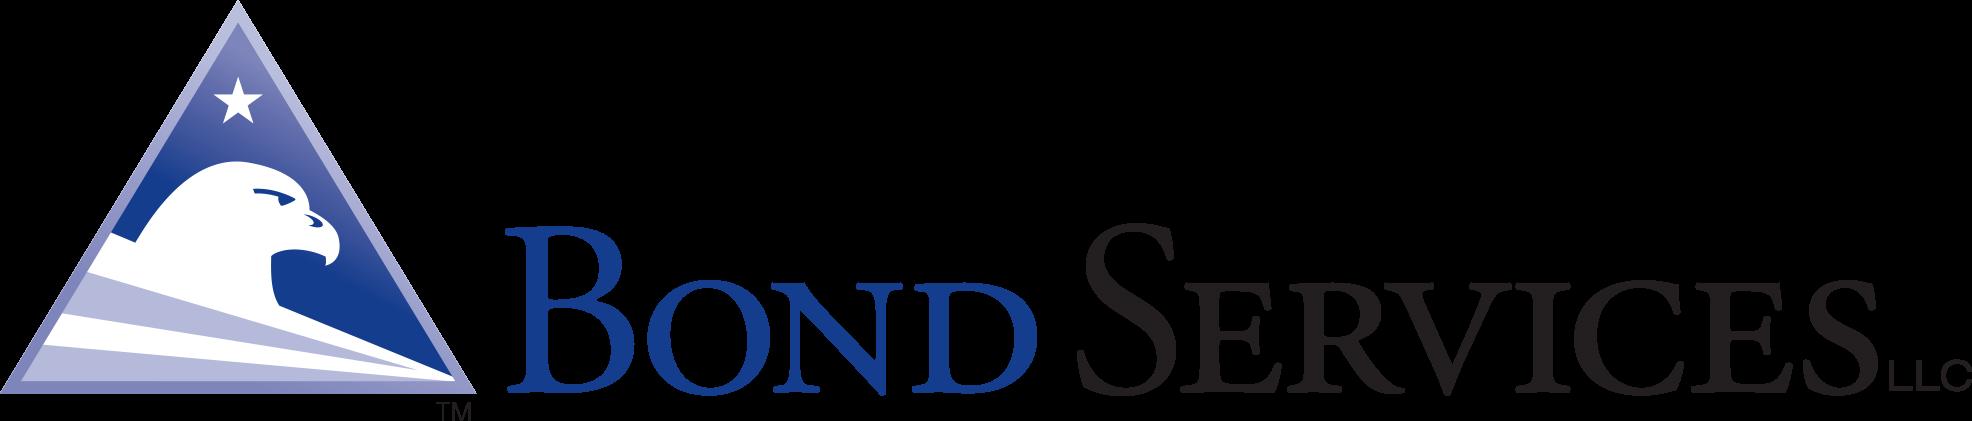 bondservices_logo_horz.png